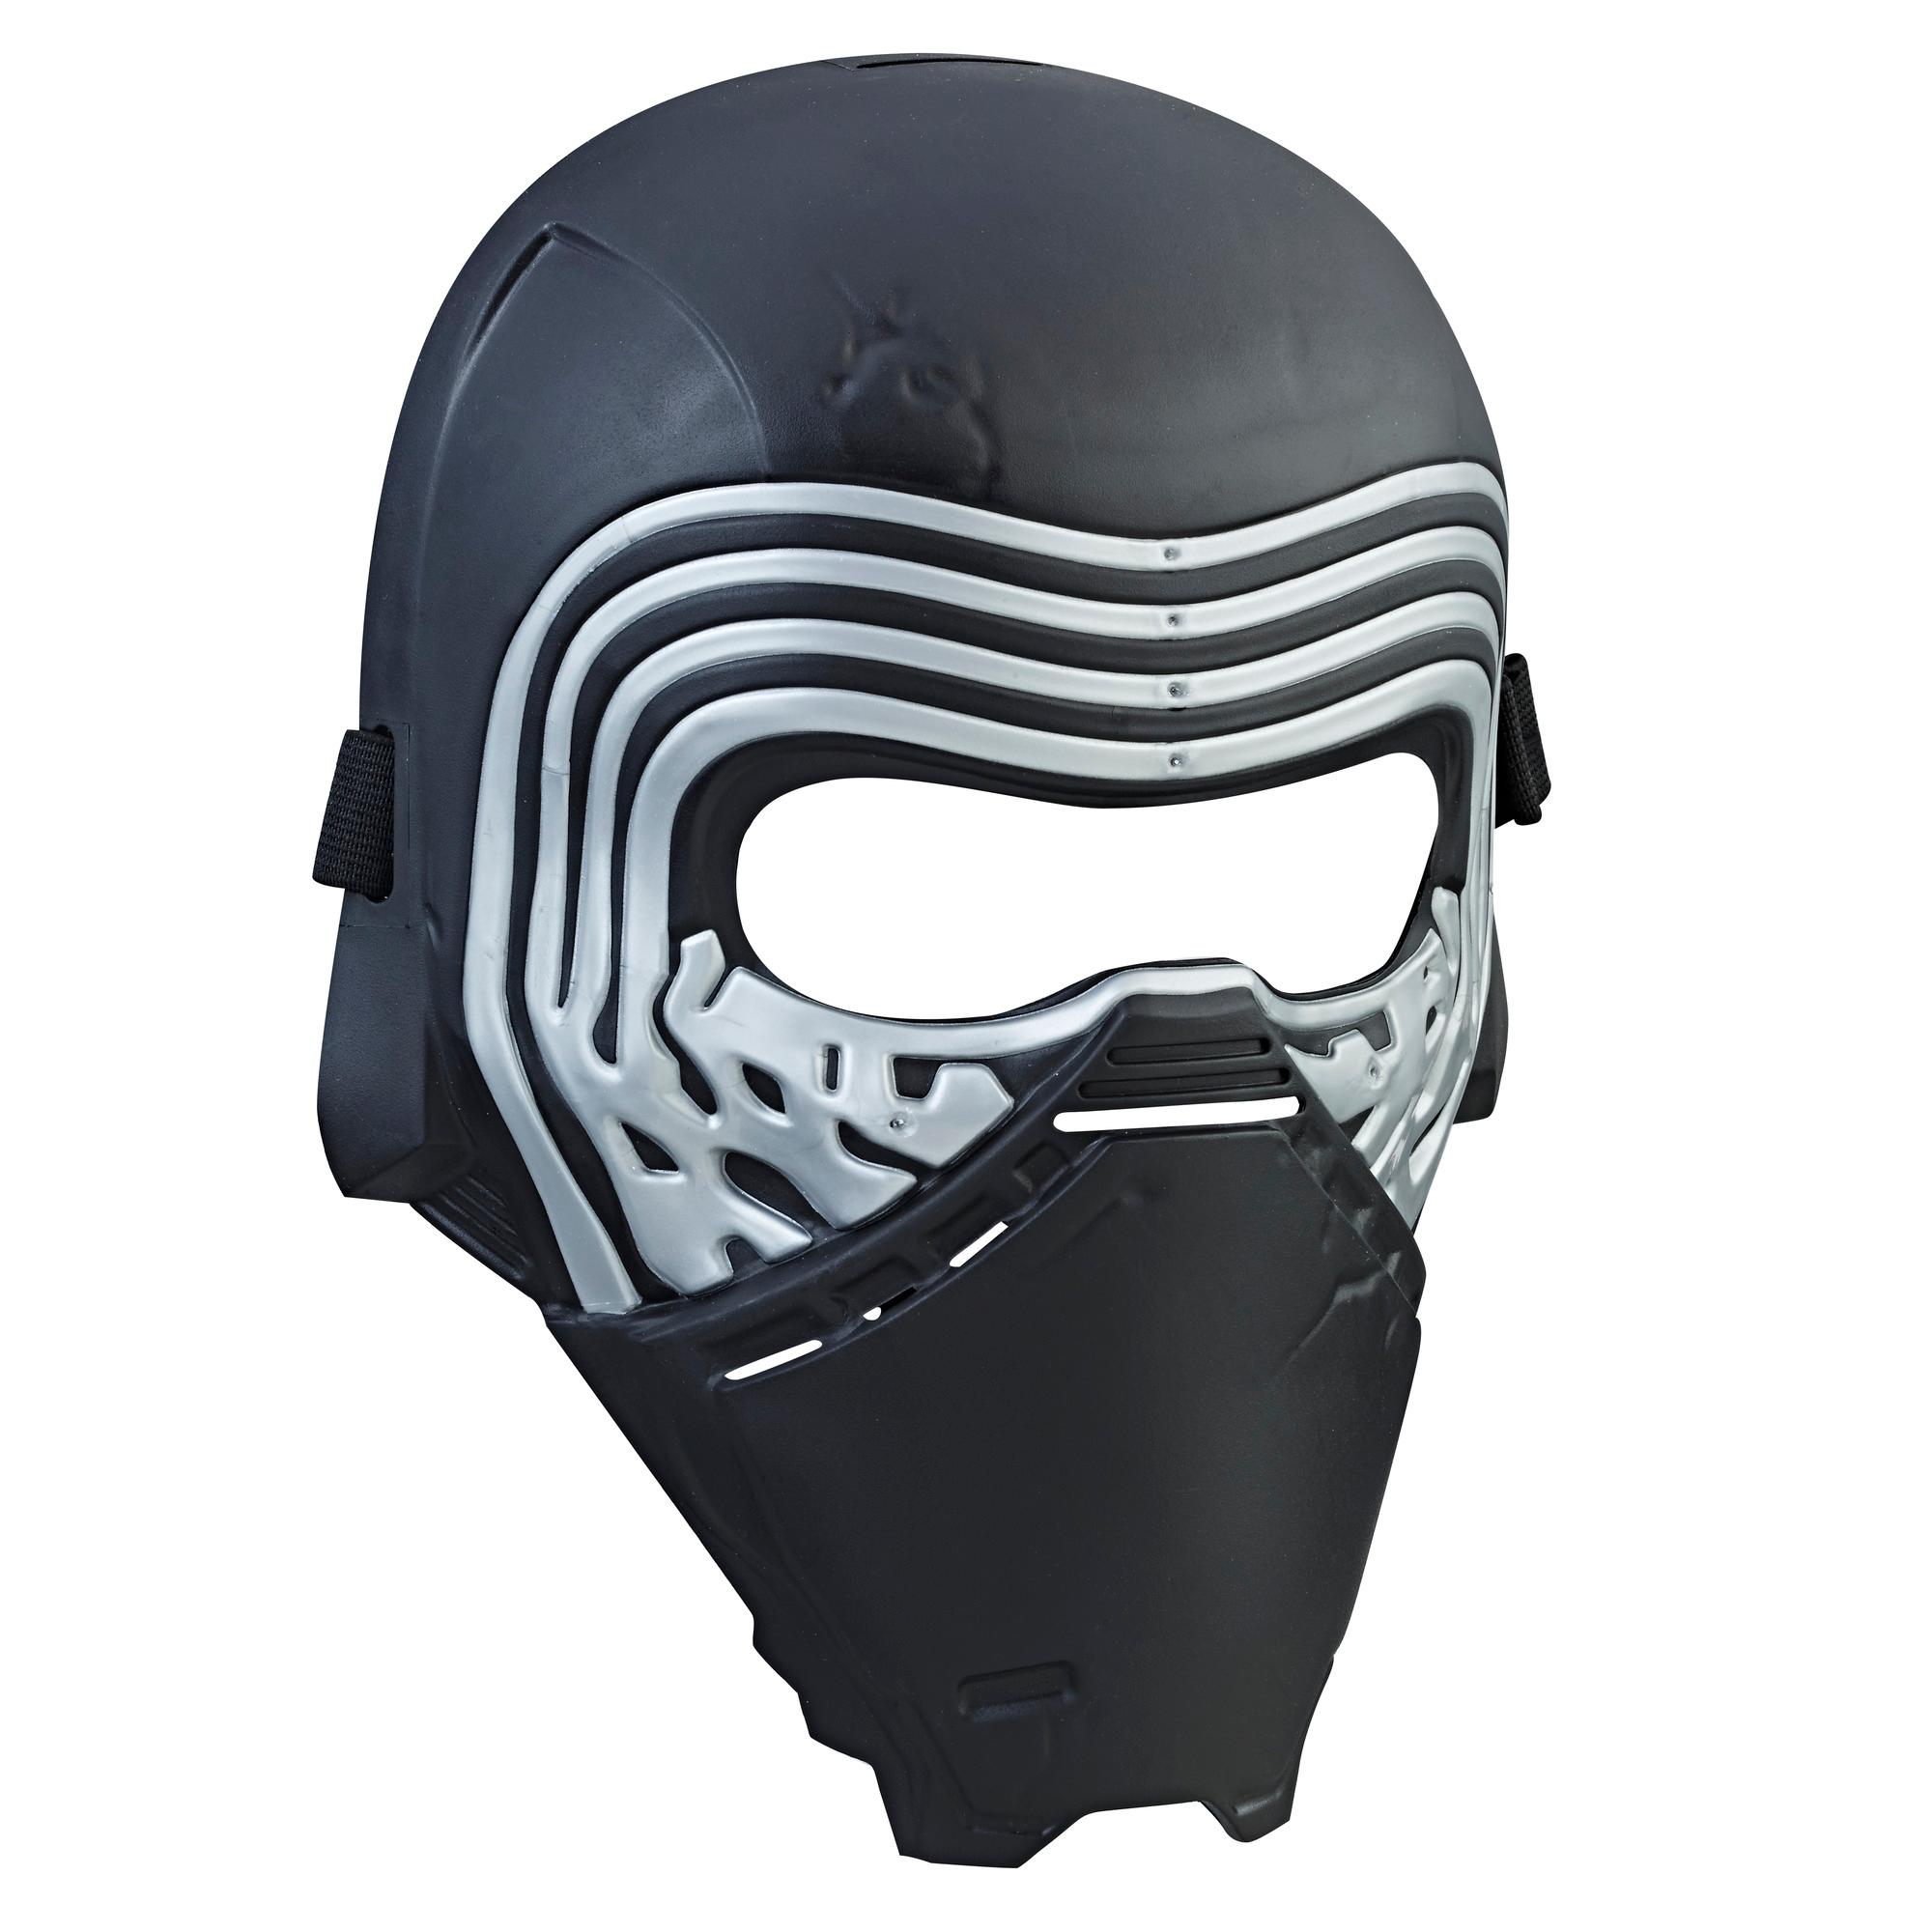 Star Wars : Les Derniers Jedi - Masque de Kylo Ren